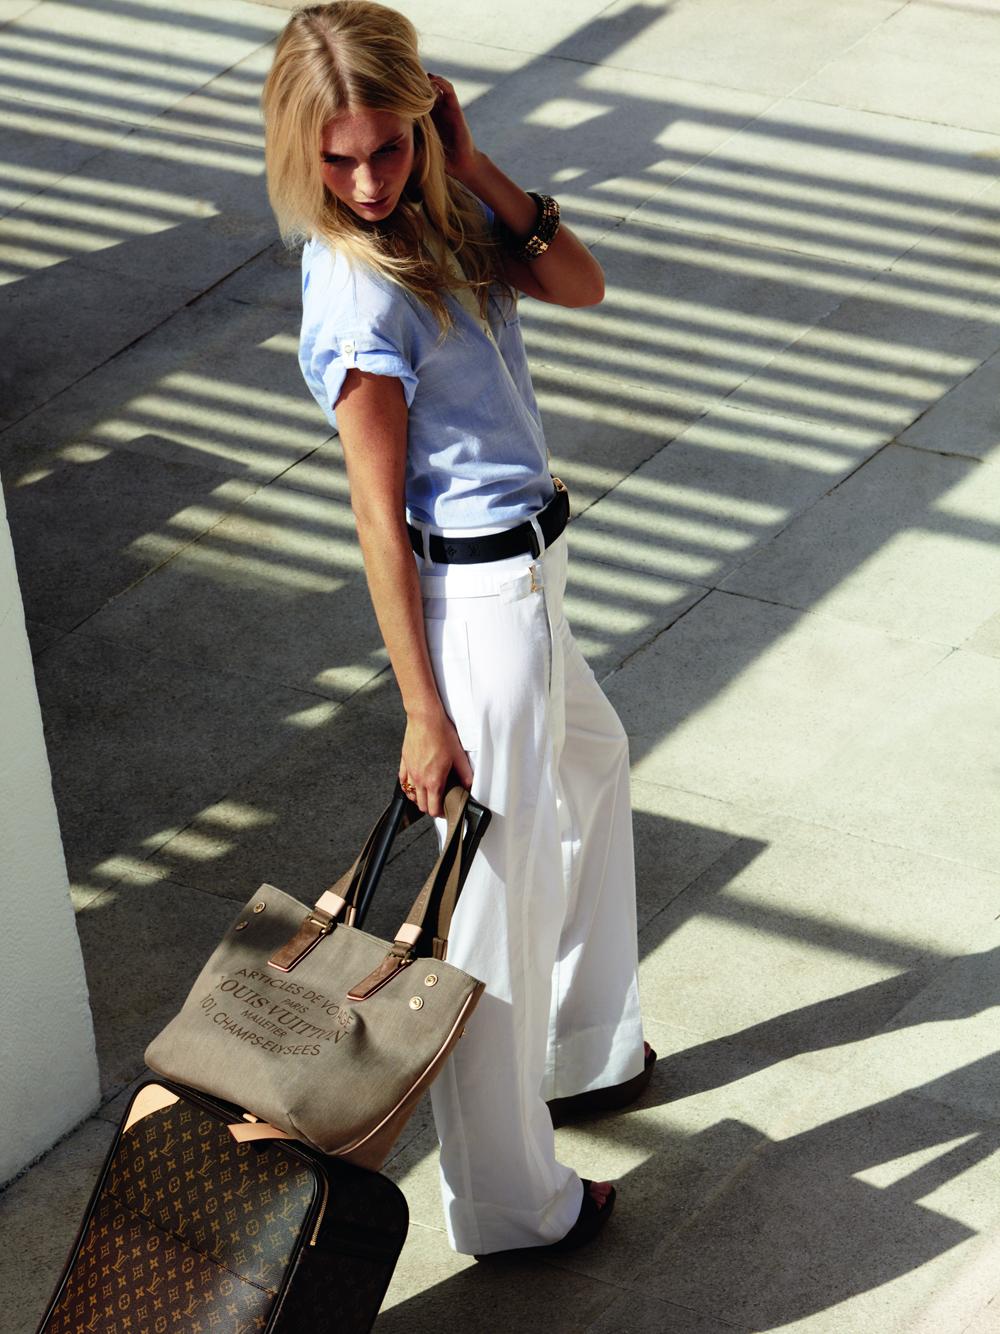 Сумка Louis Vuitton Speedy - Моя любимая сумка